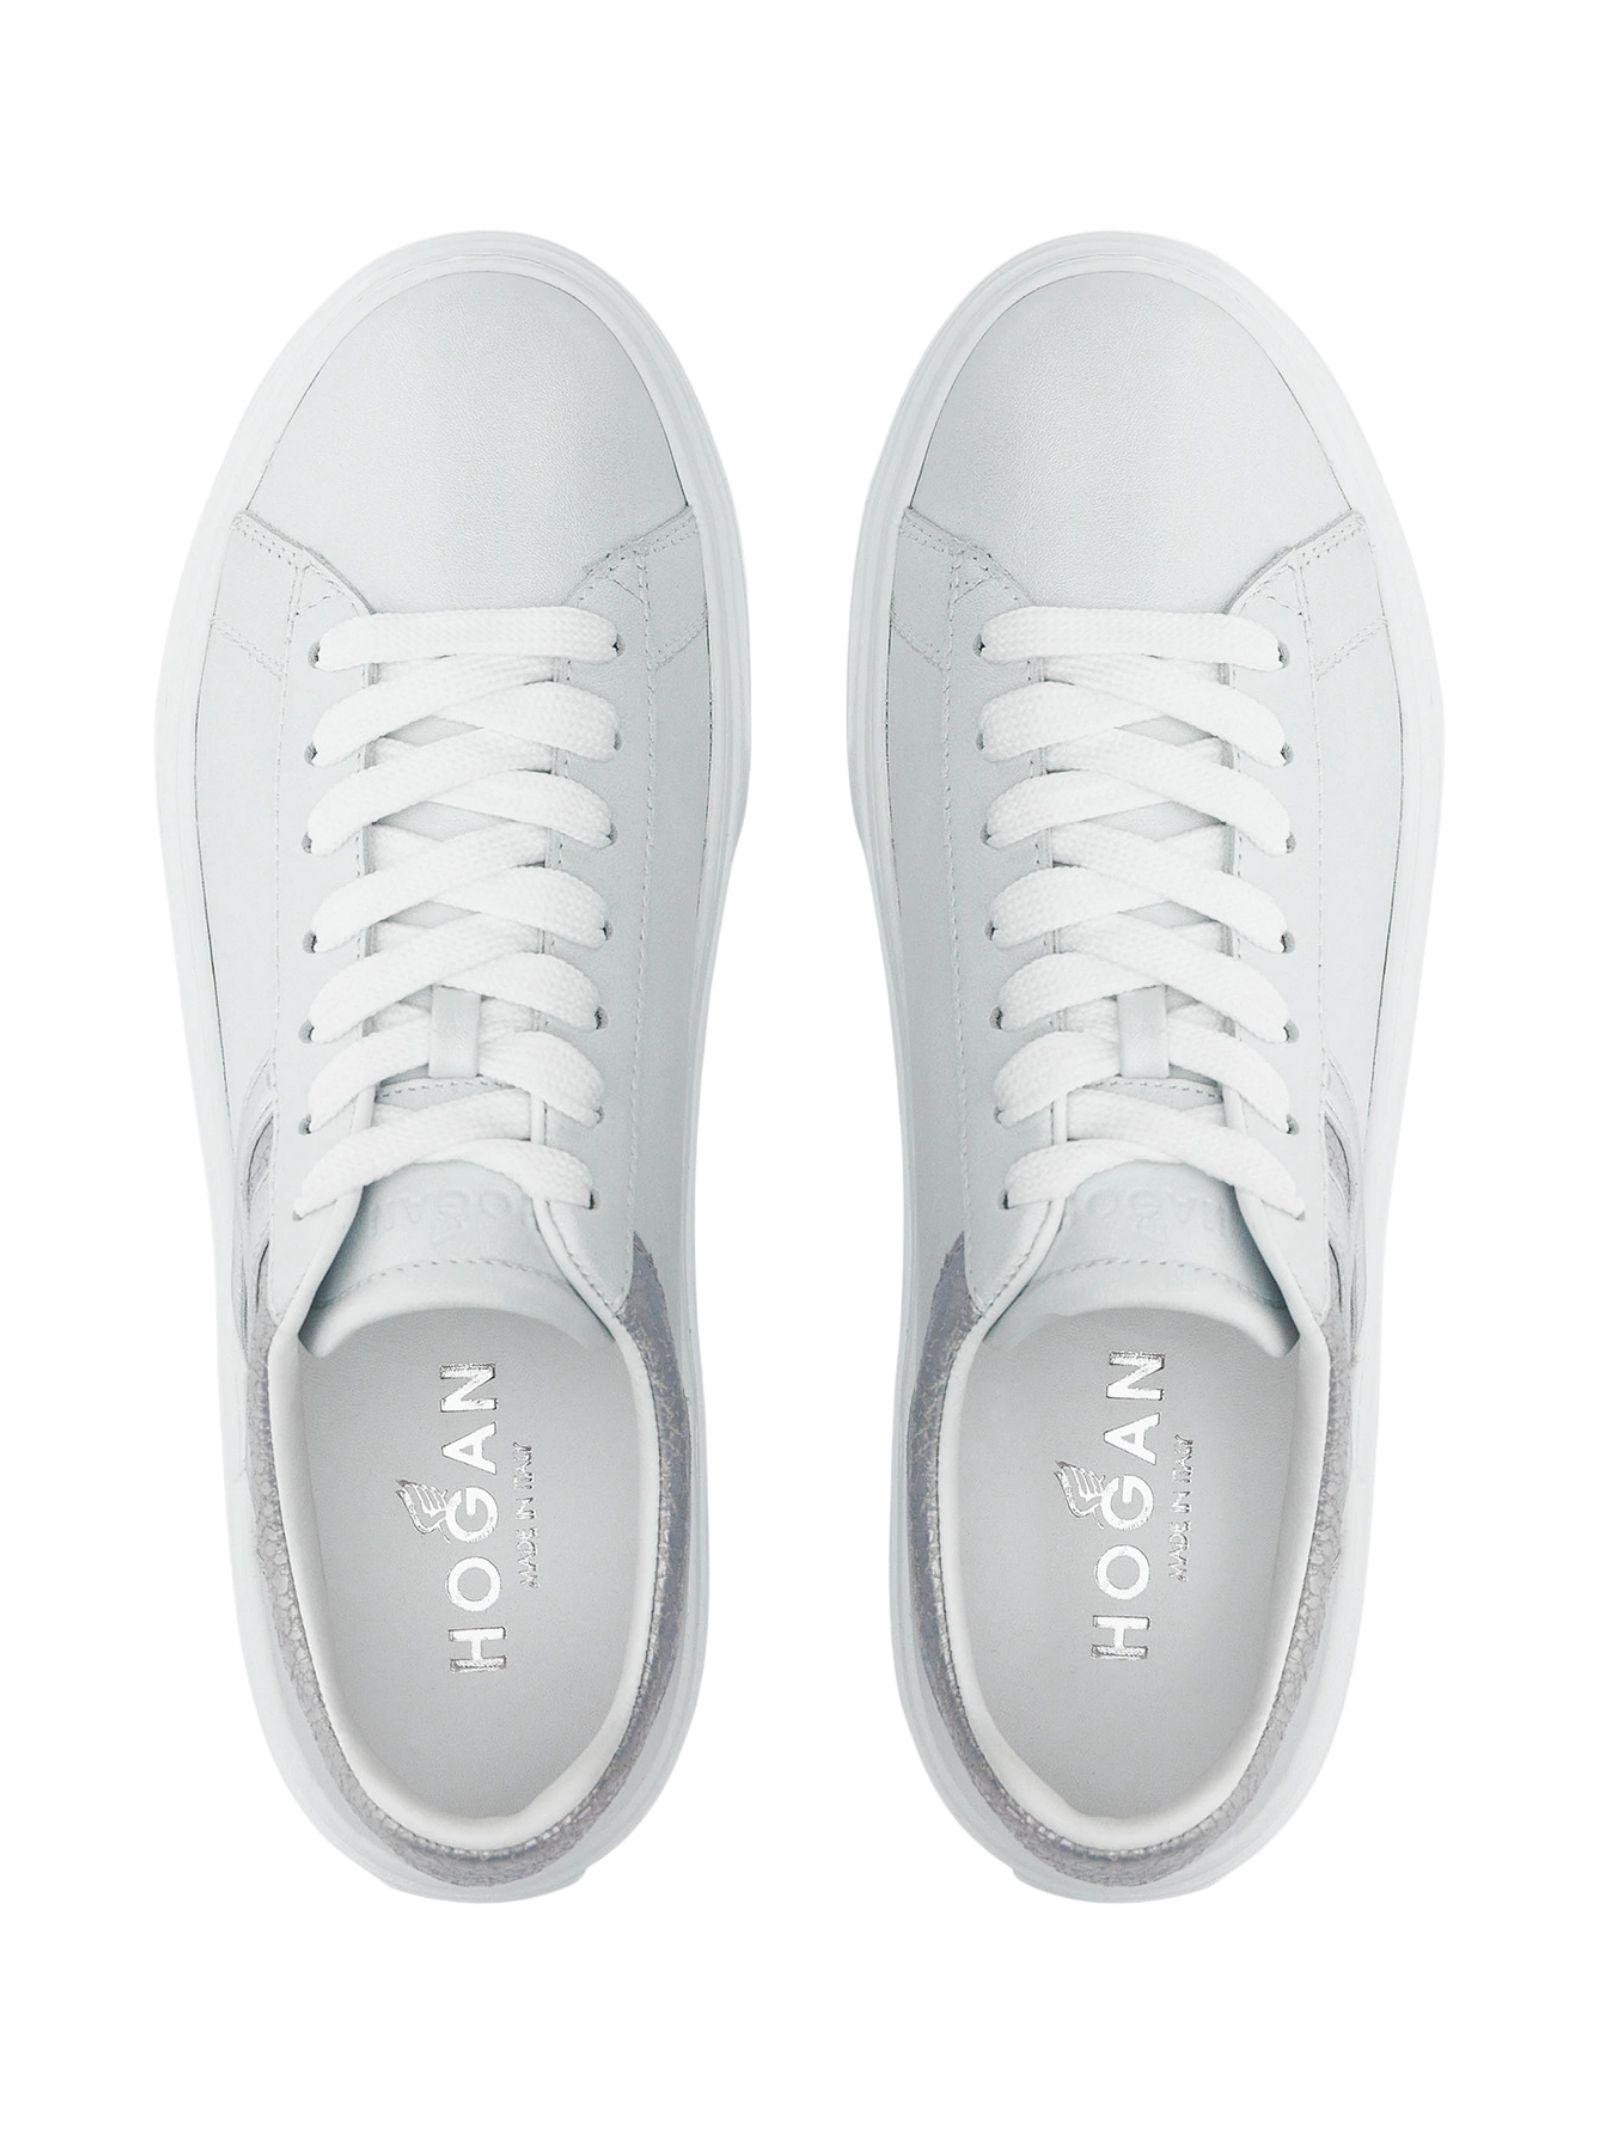 Sneakers in pelle e glitter HOGAN | Scarpe | HXW3650J970P970351